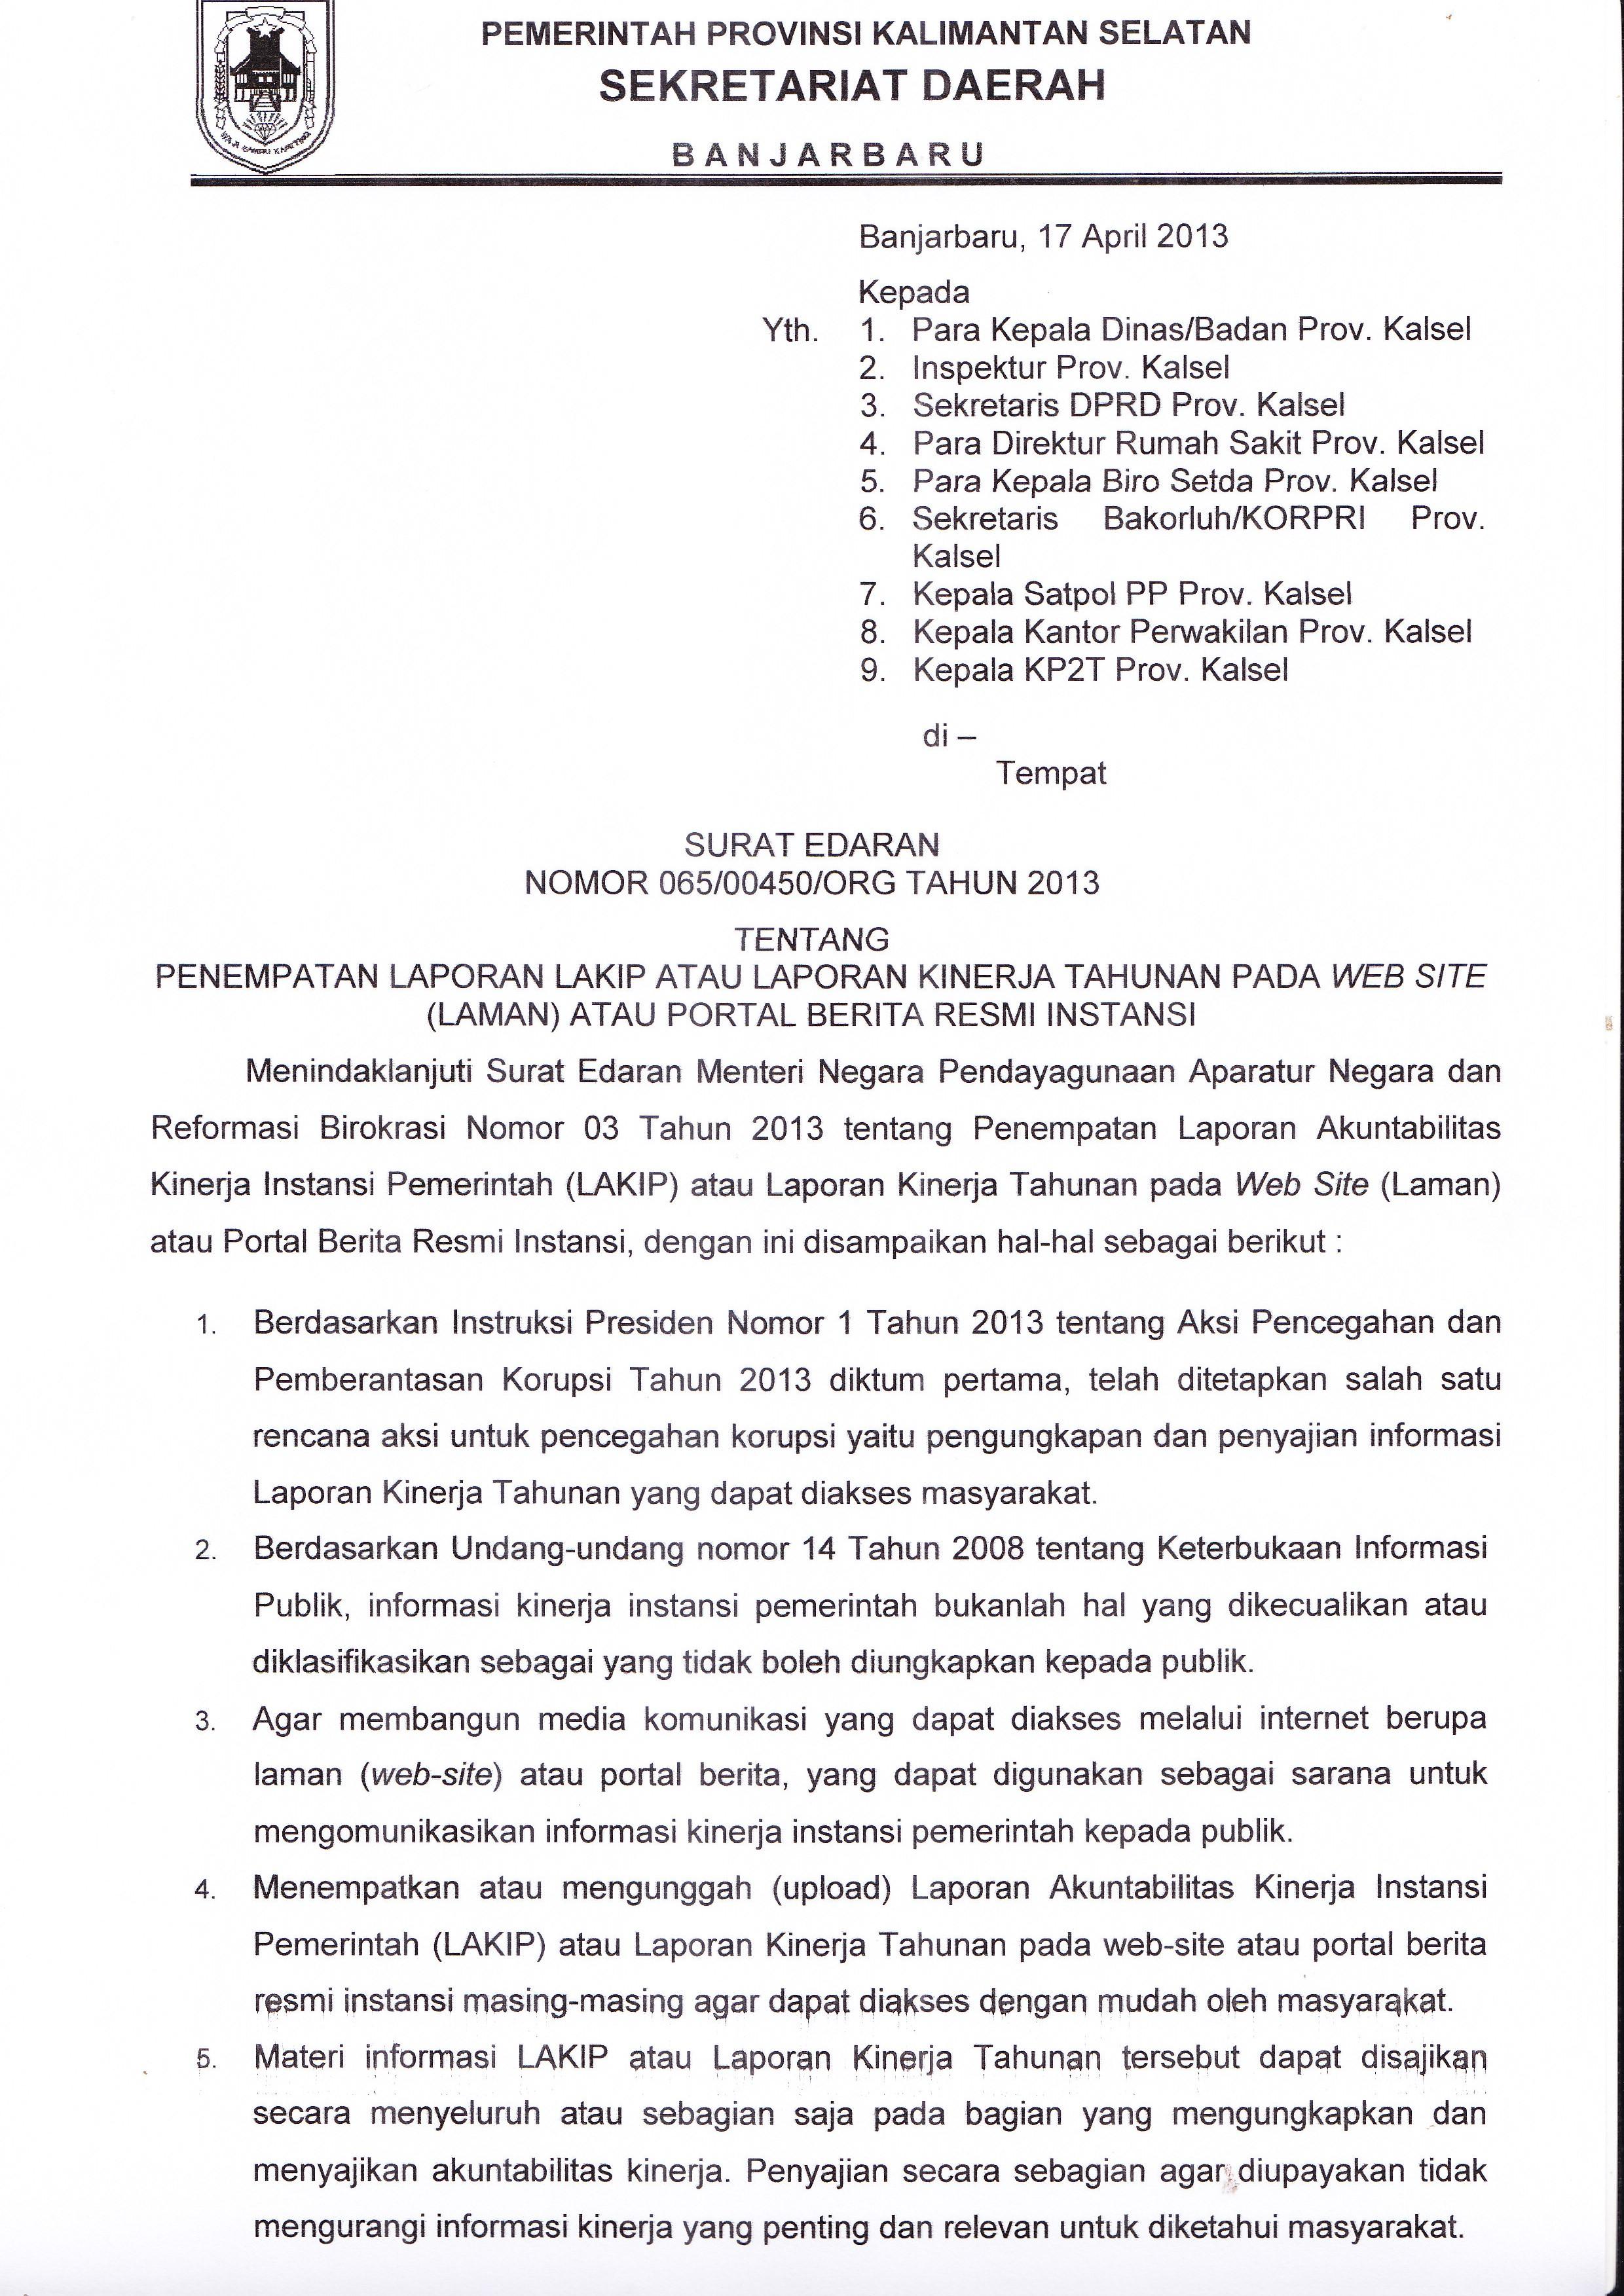 Contoh Surat Edaran Tatalaksana Kalsel